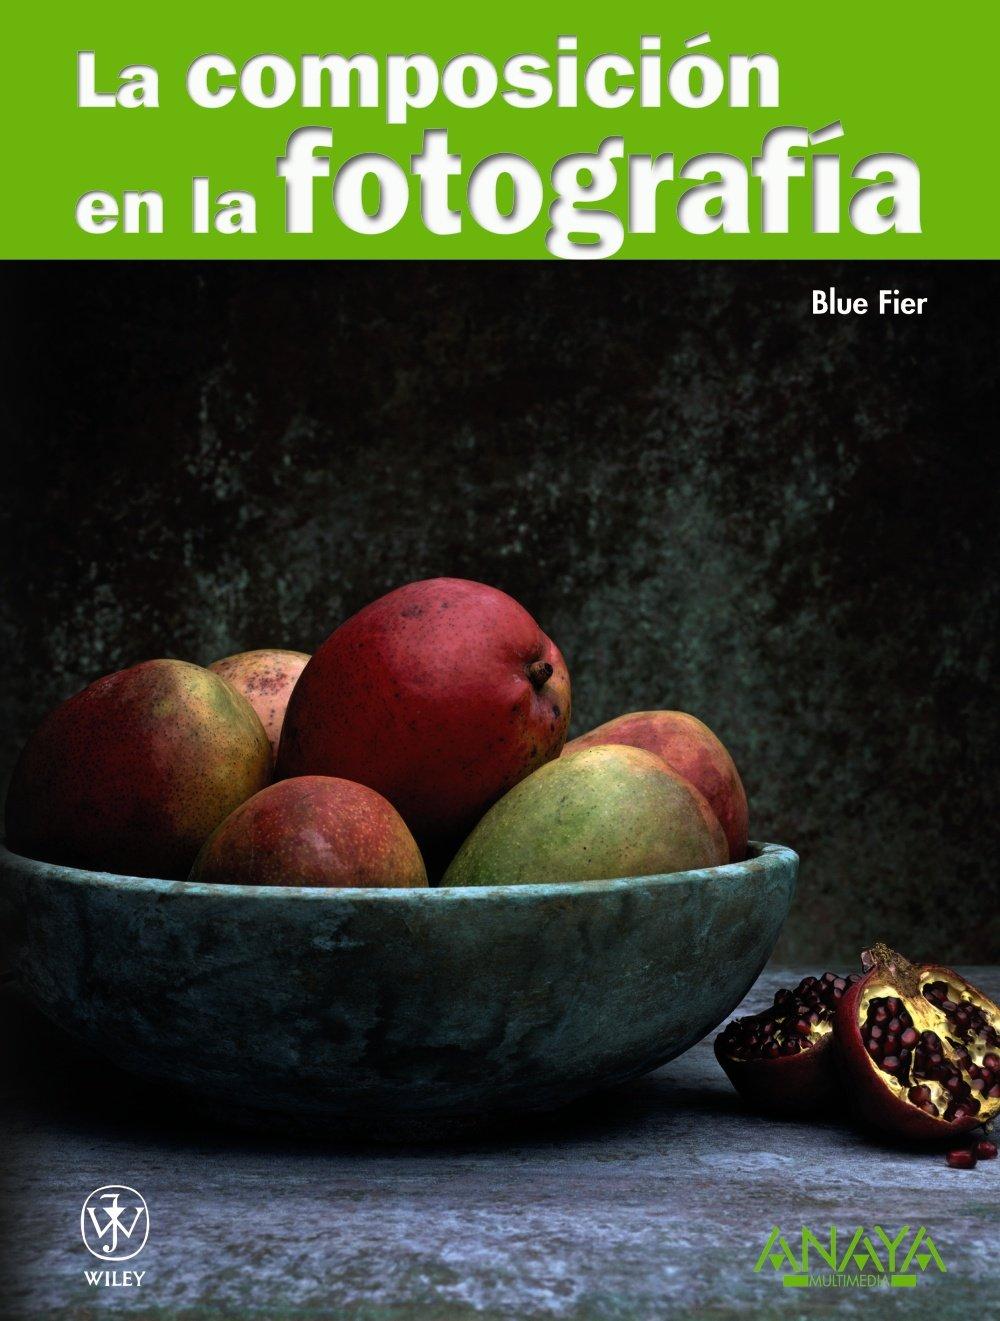 La composicion en la fotografia / Composition Photo Workshop (Spanish Edition) PDF